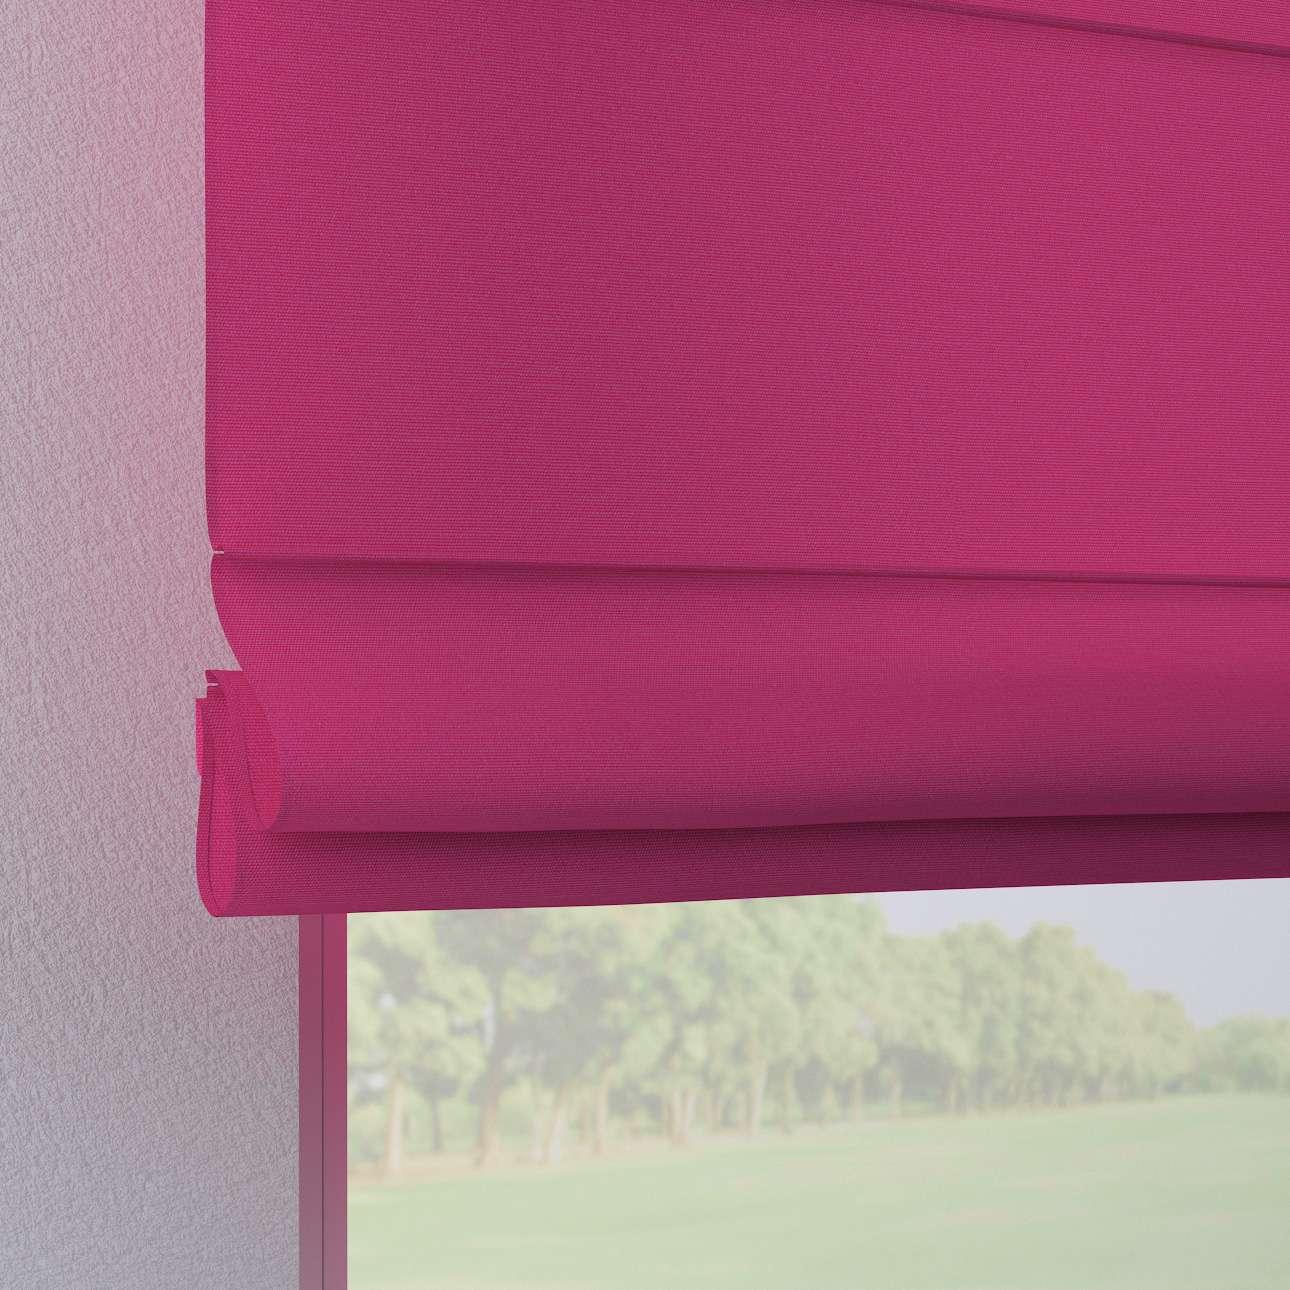 Foldegardin Verona<br/>Med stropper til gardinstang 80 x 170 cm fra kollektionen Loneta, Stof: 133-60